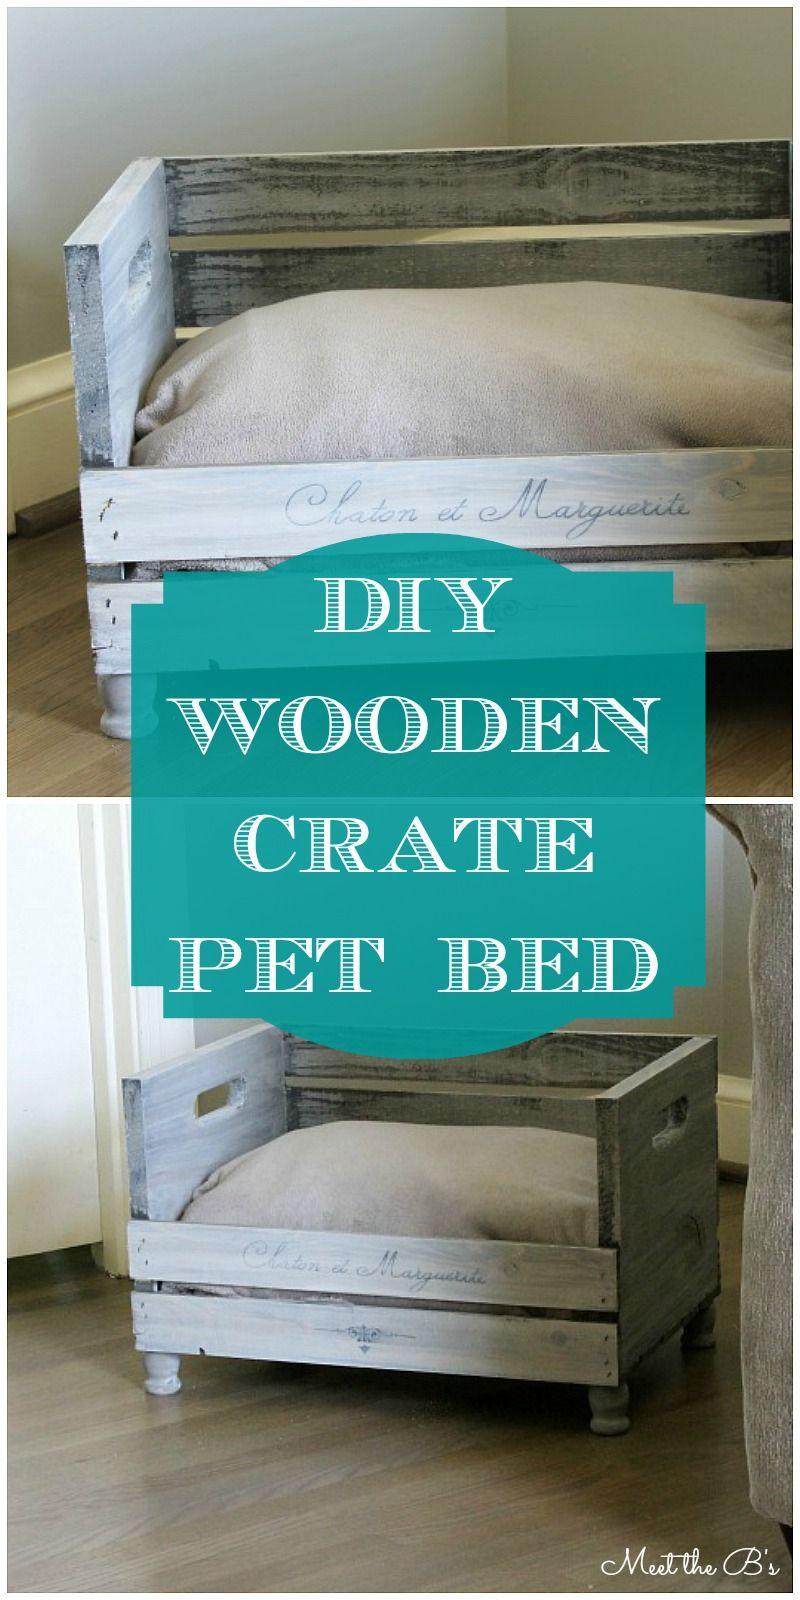 Diy Wooden Crate Pet Bed Monthlydiychallenge